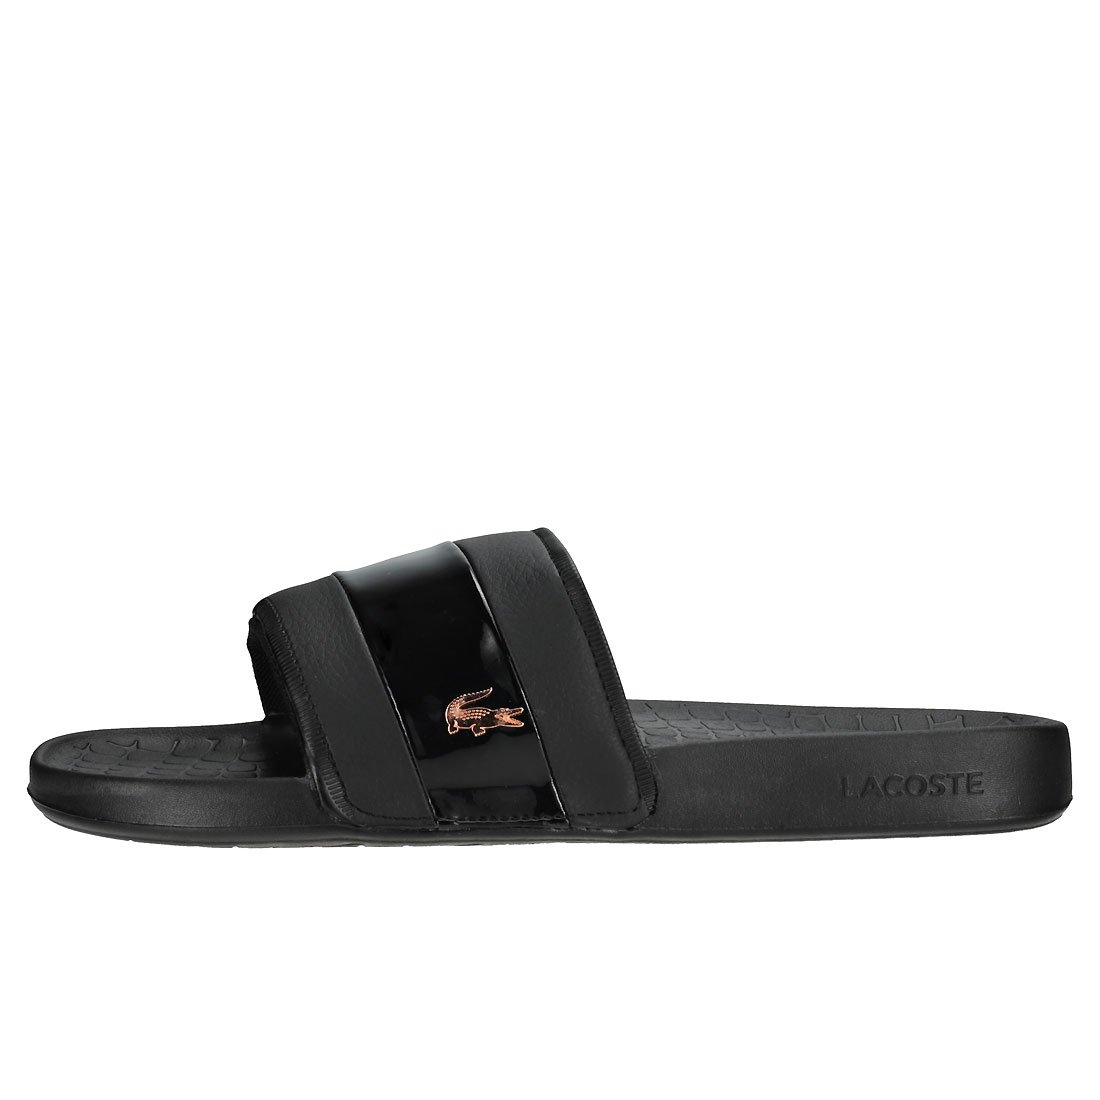 36ee725c4dfcfc Lacoste Fraisier 118 2 U Slide Pool Beach Deluxe Sandals in Black   Rose  Gold 735CAW0090 1J1  Amazon.co.uk  Shoes   Bags